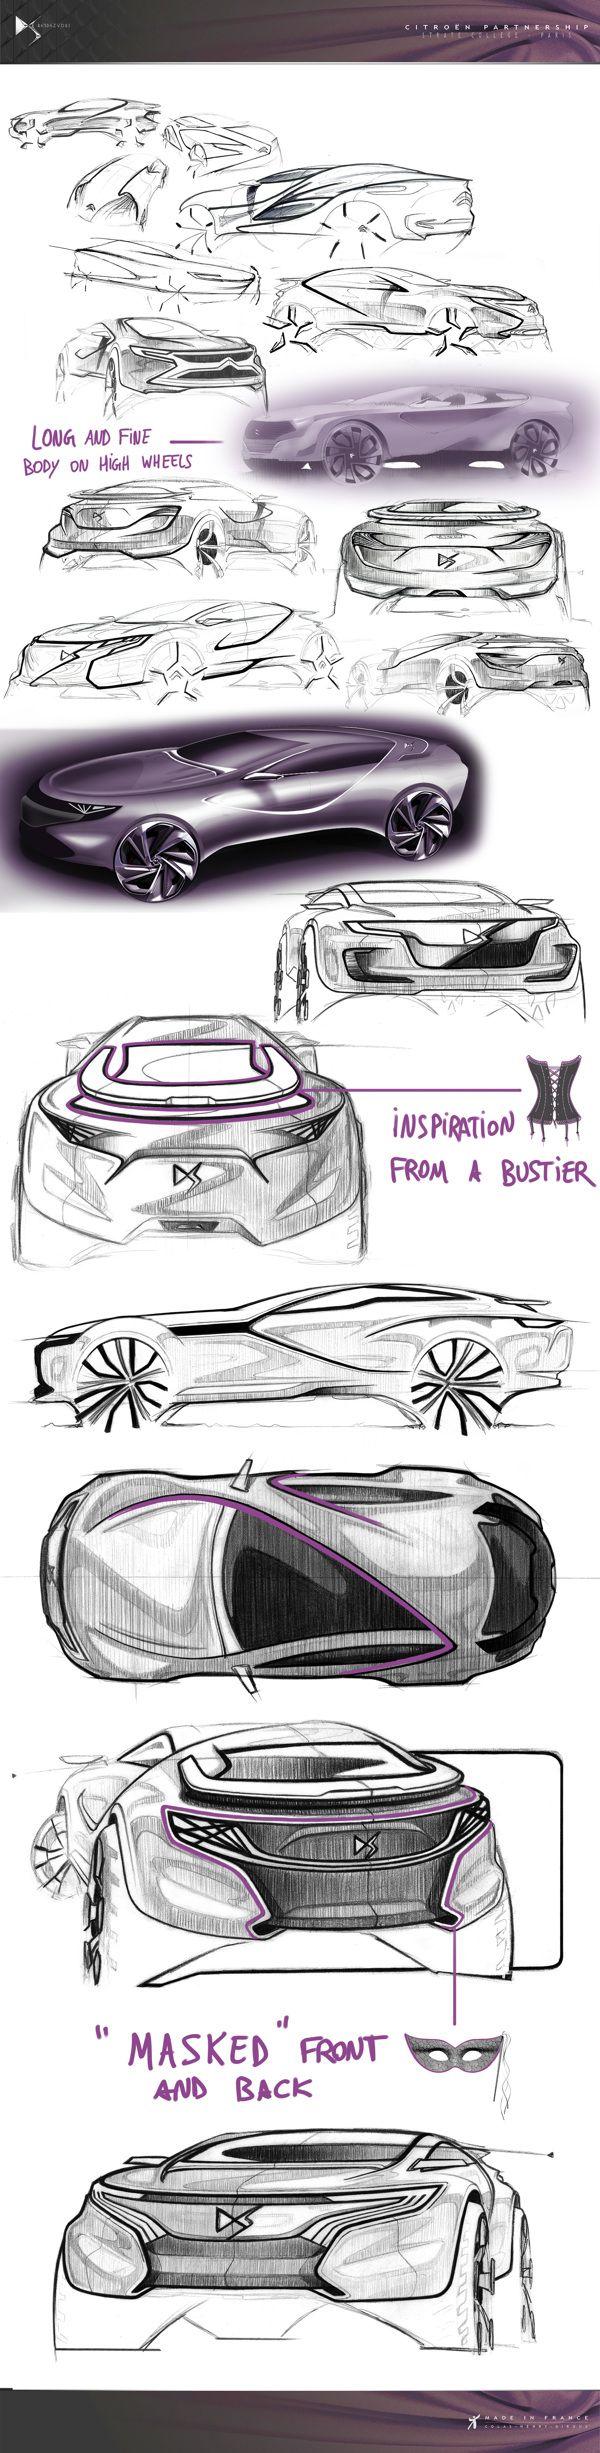 Citroën DS Episode - Exterior/Interior Design by Christopher Giroux, via Behance